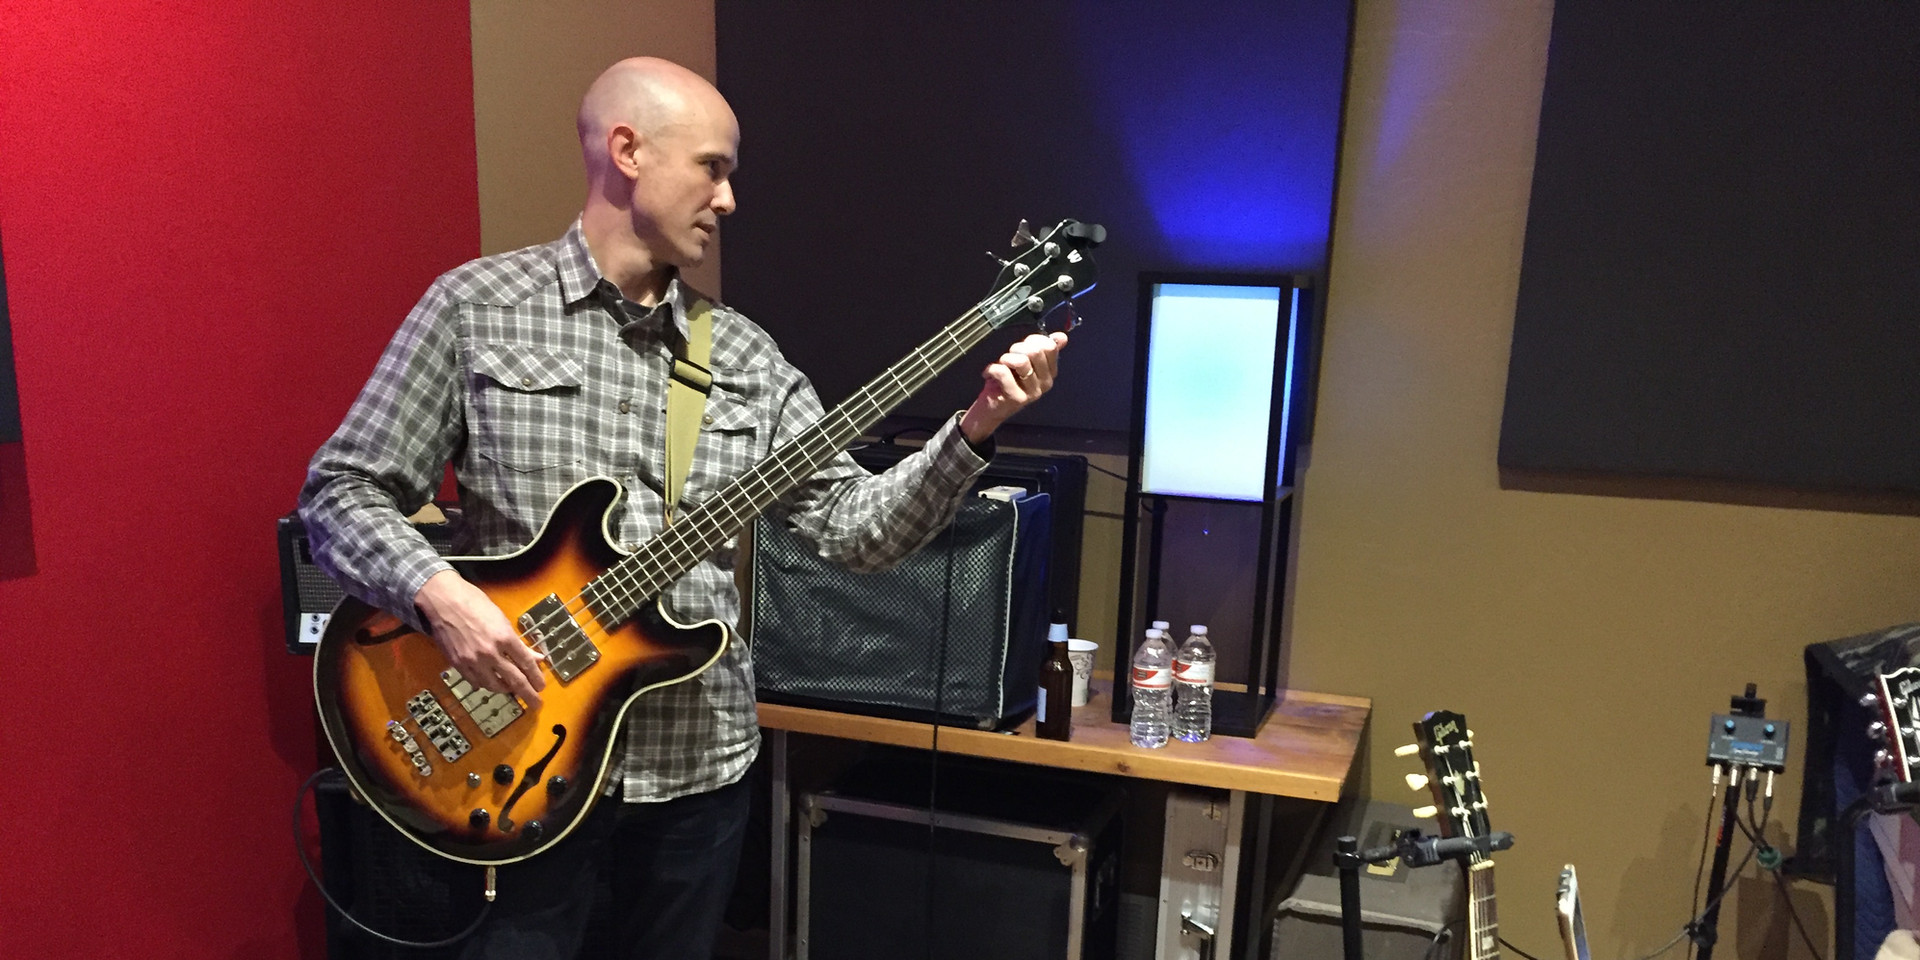 James at Alexander Recording Studio in Ames